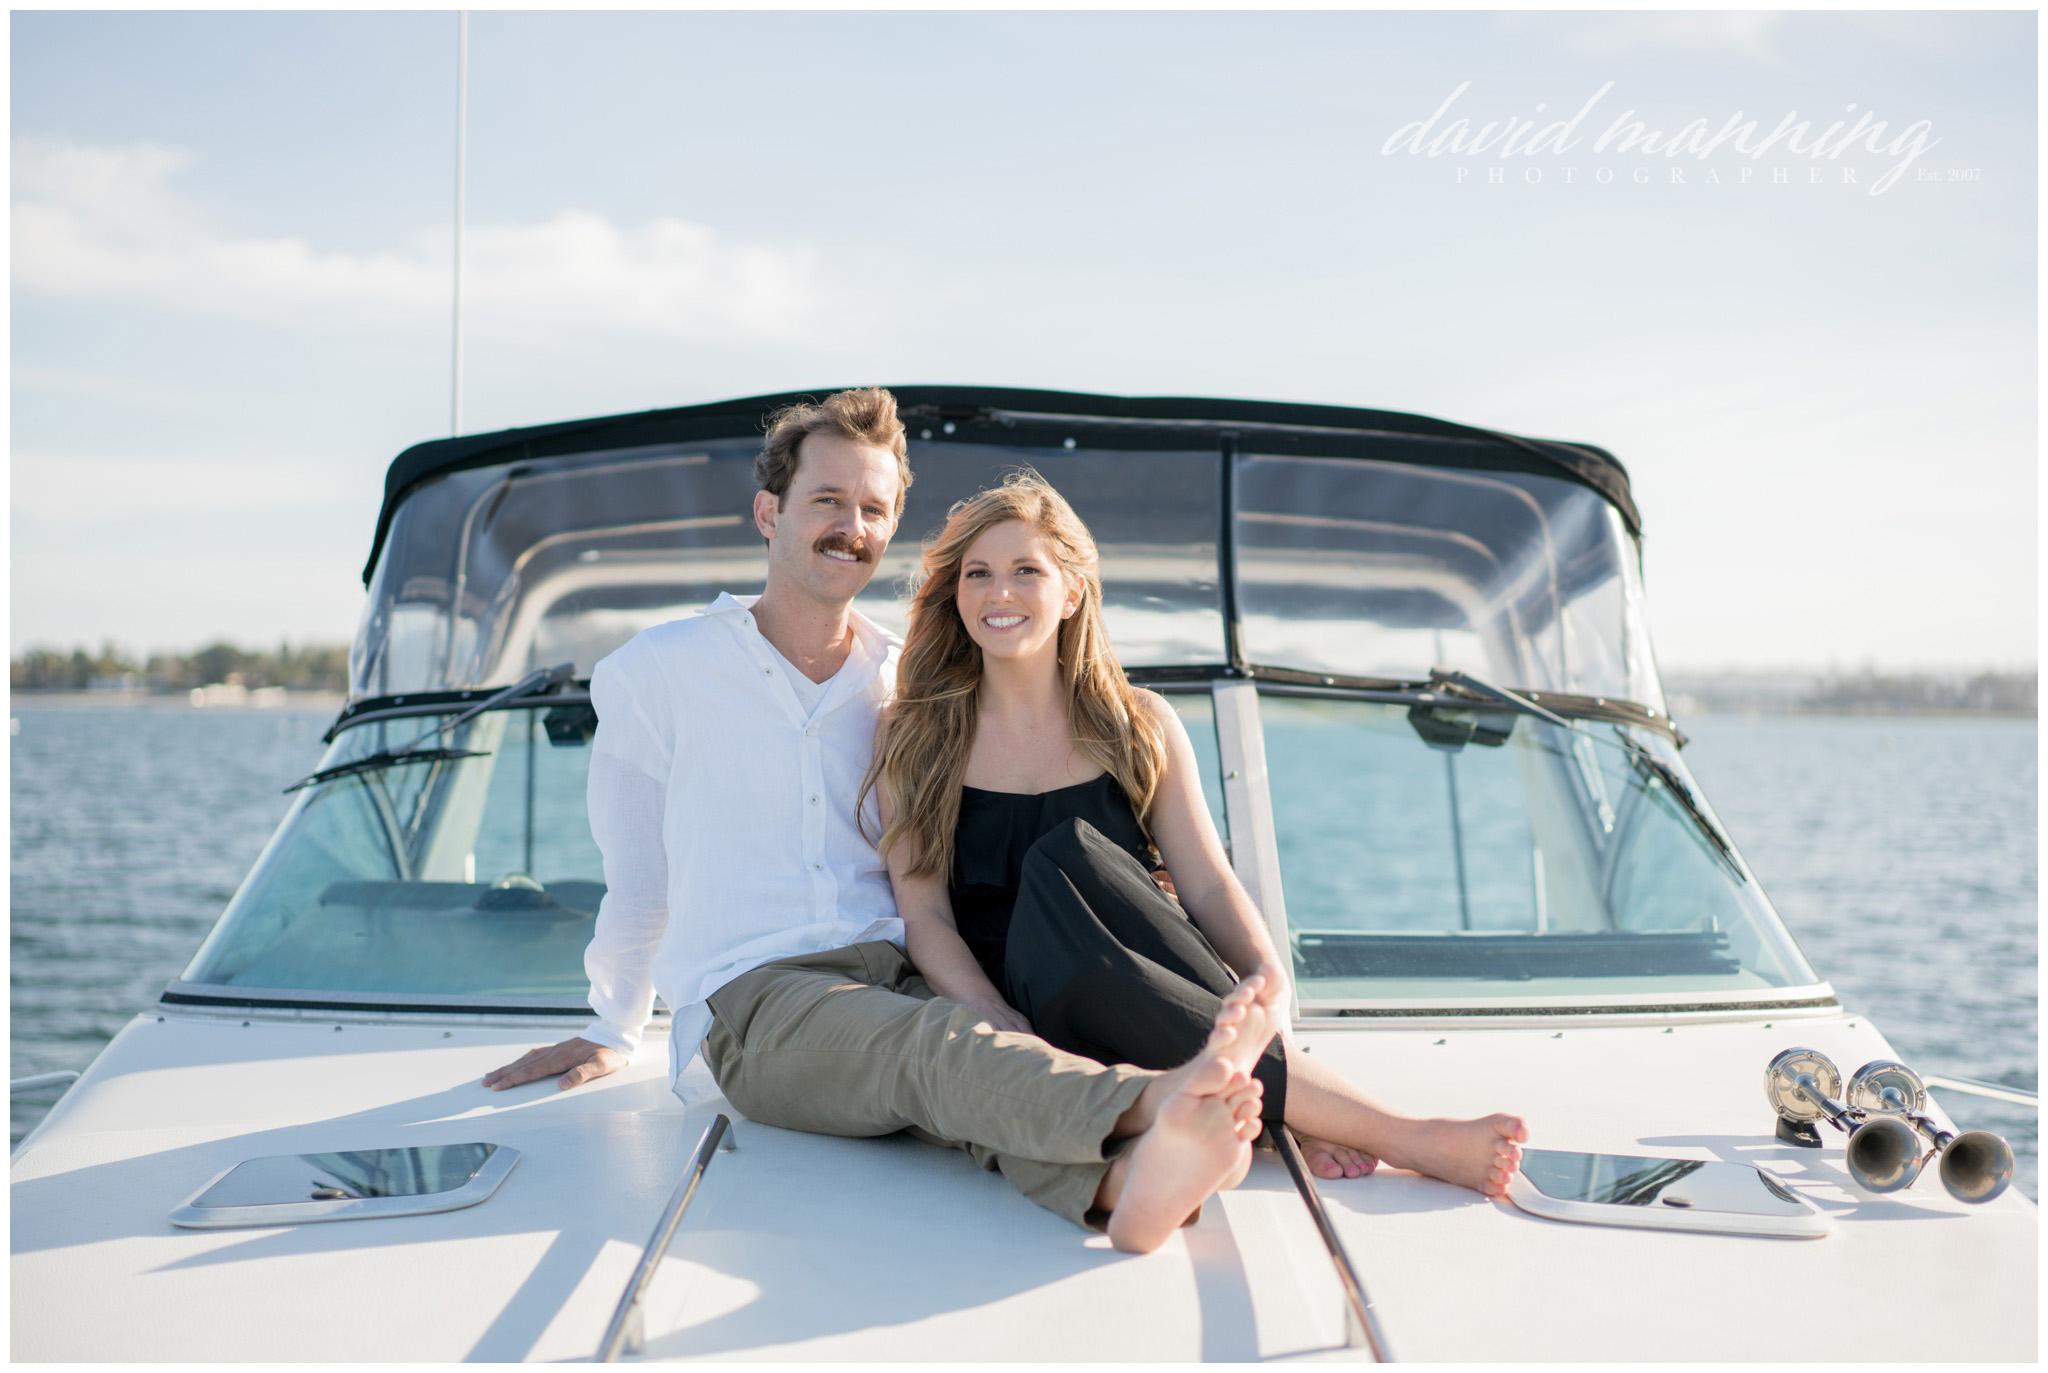 Alyssa-Taylor-Engagement-David-Manning-Photographer-0070.JPG